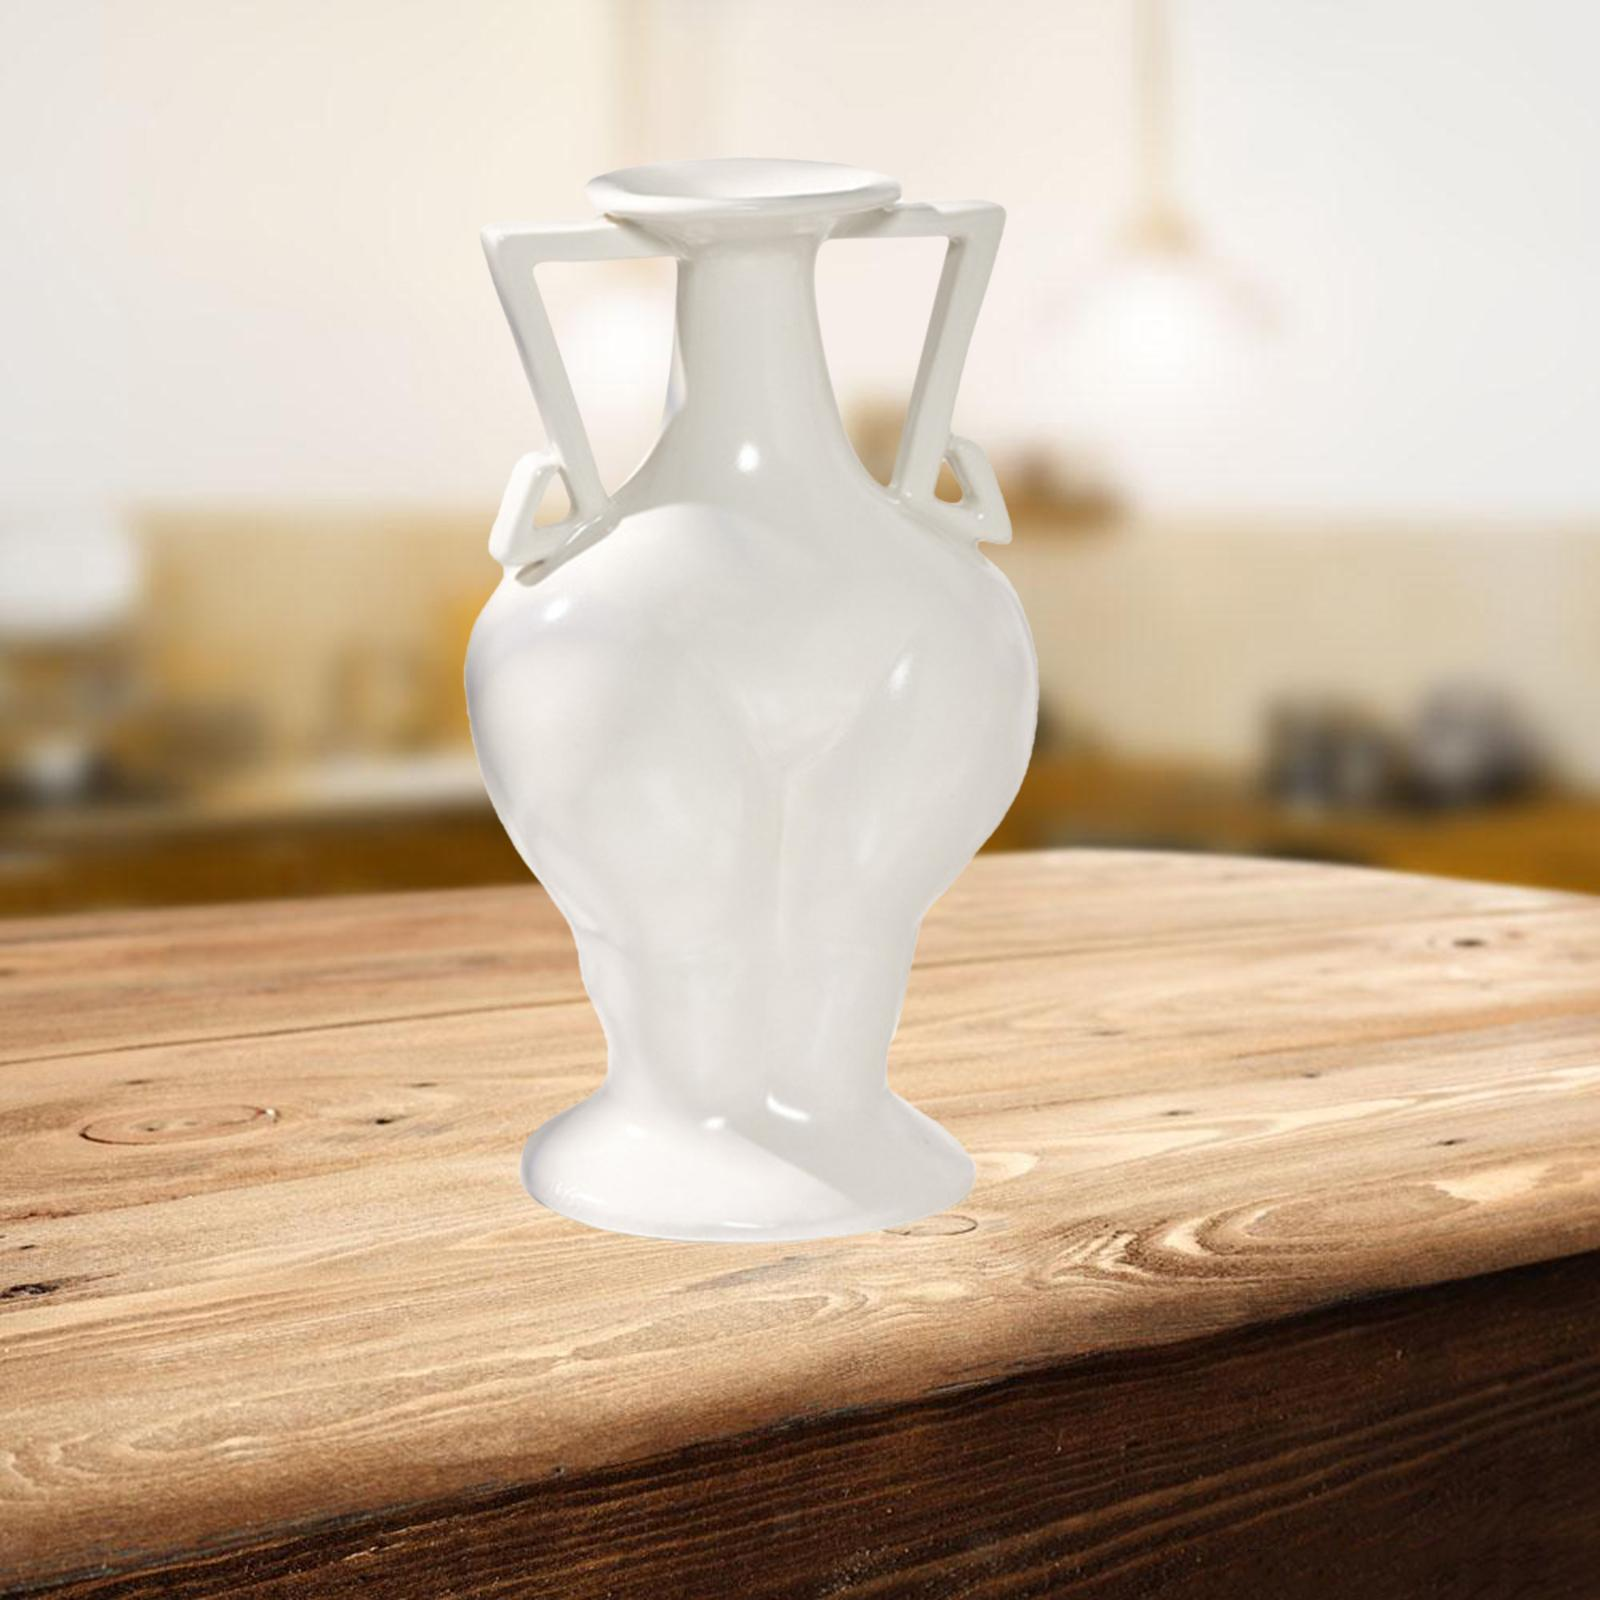 Indexbild 16 - Blumenvase Keramik Blumentöpfe Trockenblumenhalter Pflanzenvasen Wohnkultur